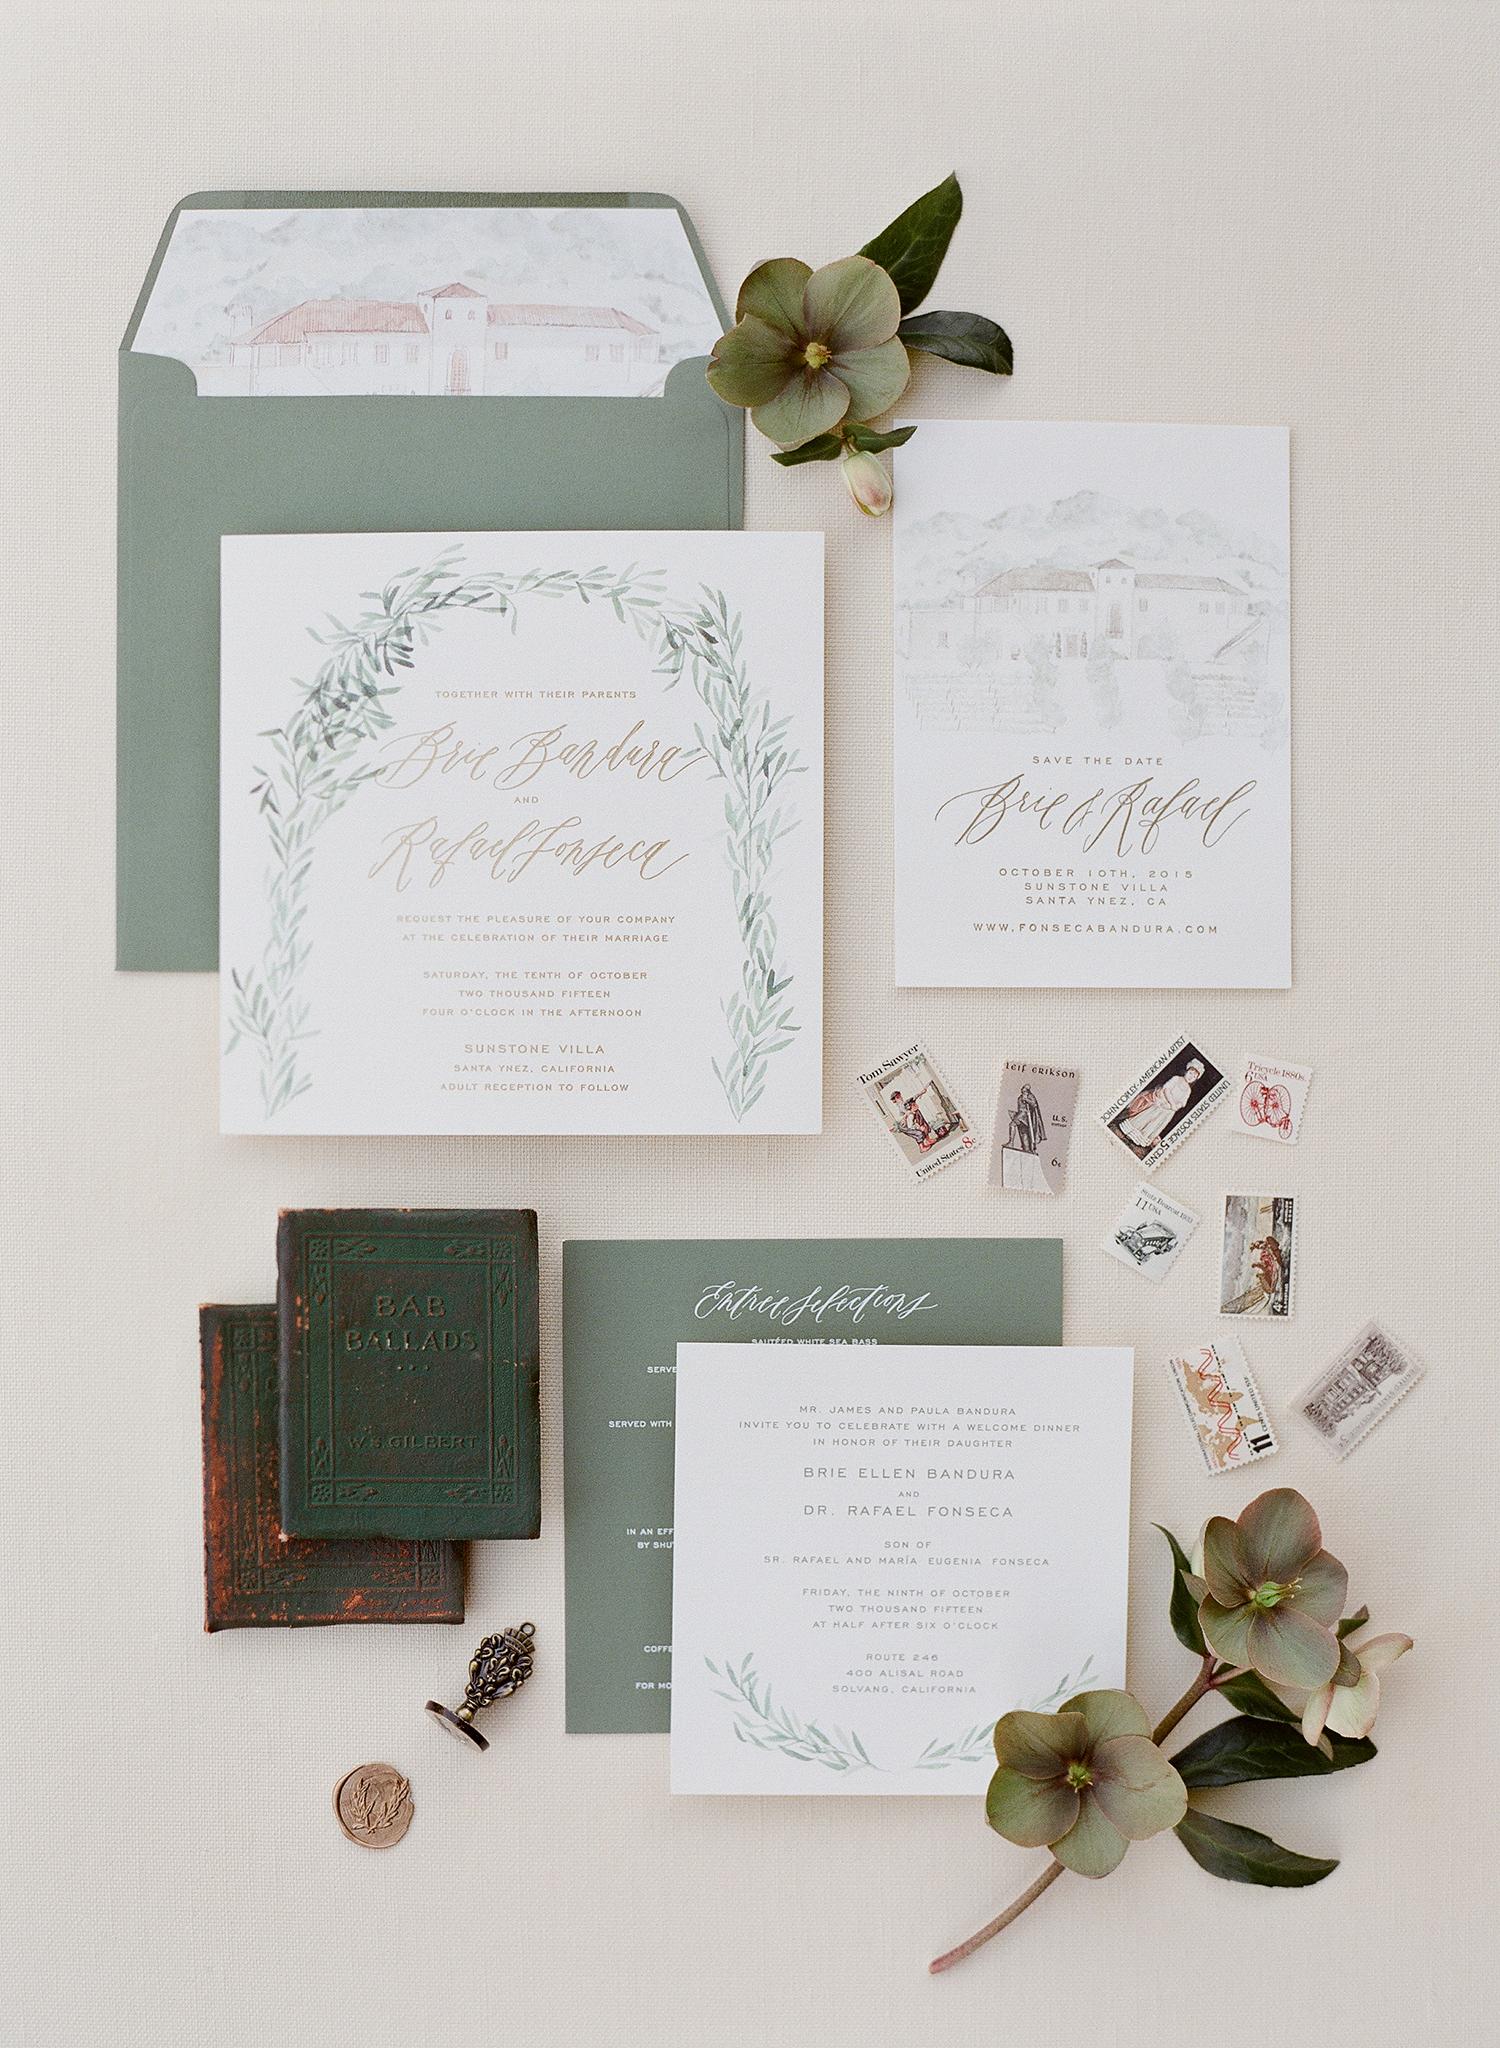 invitation suite with venue illustration